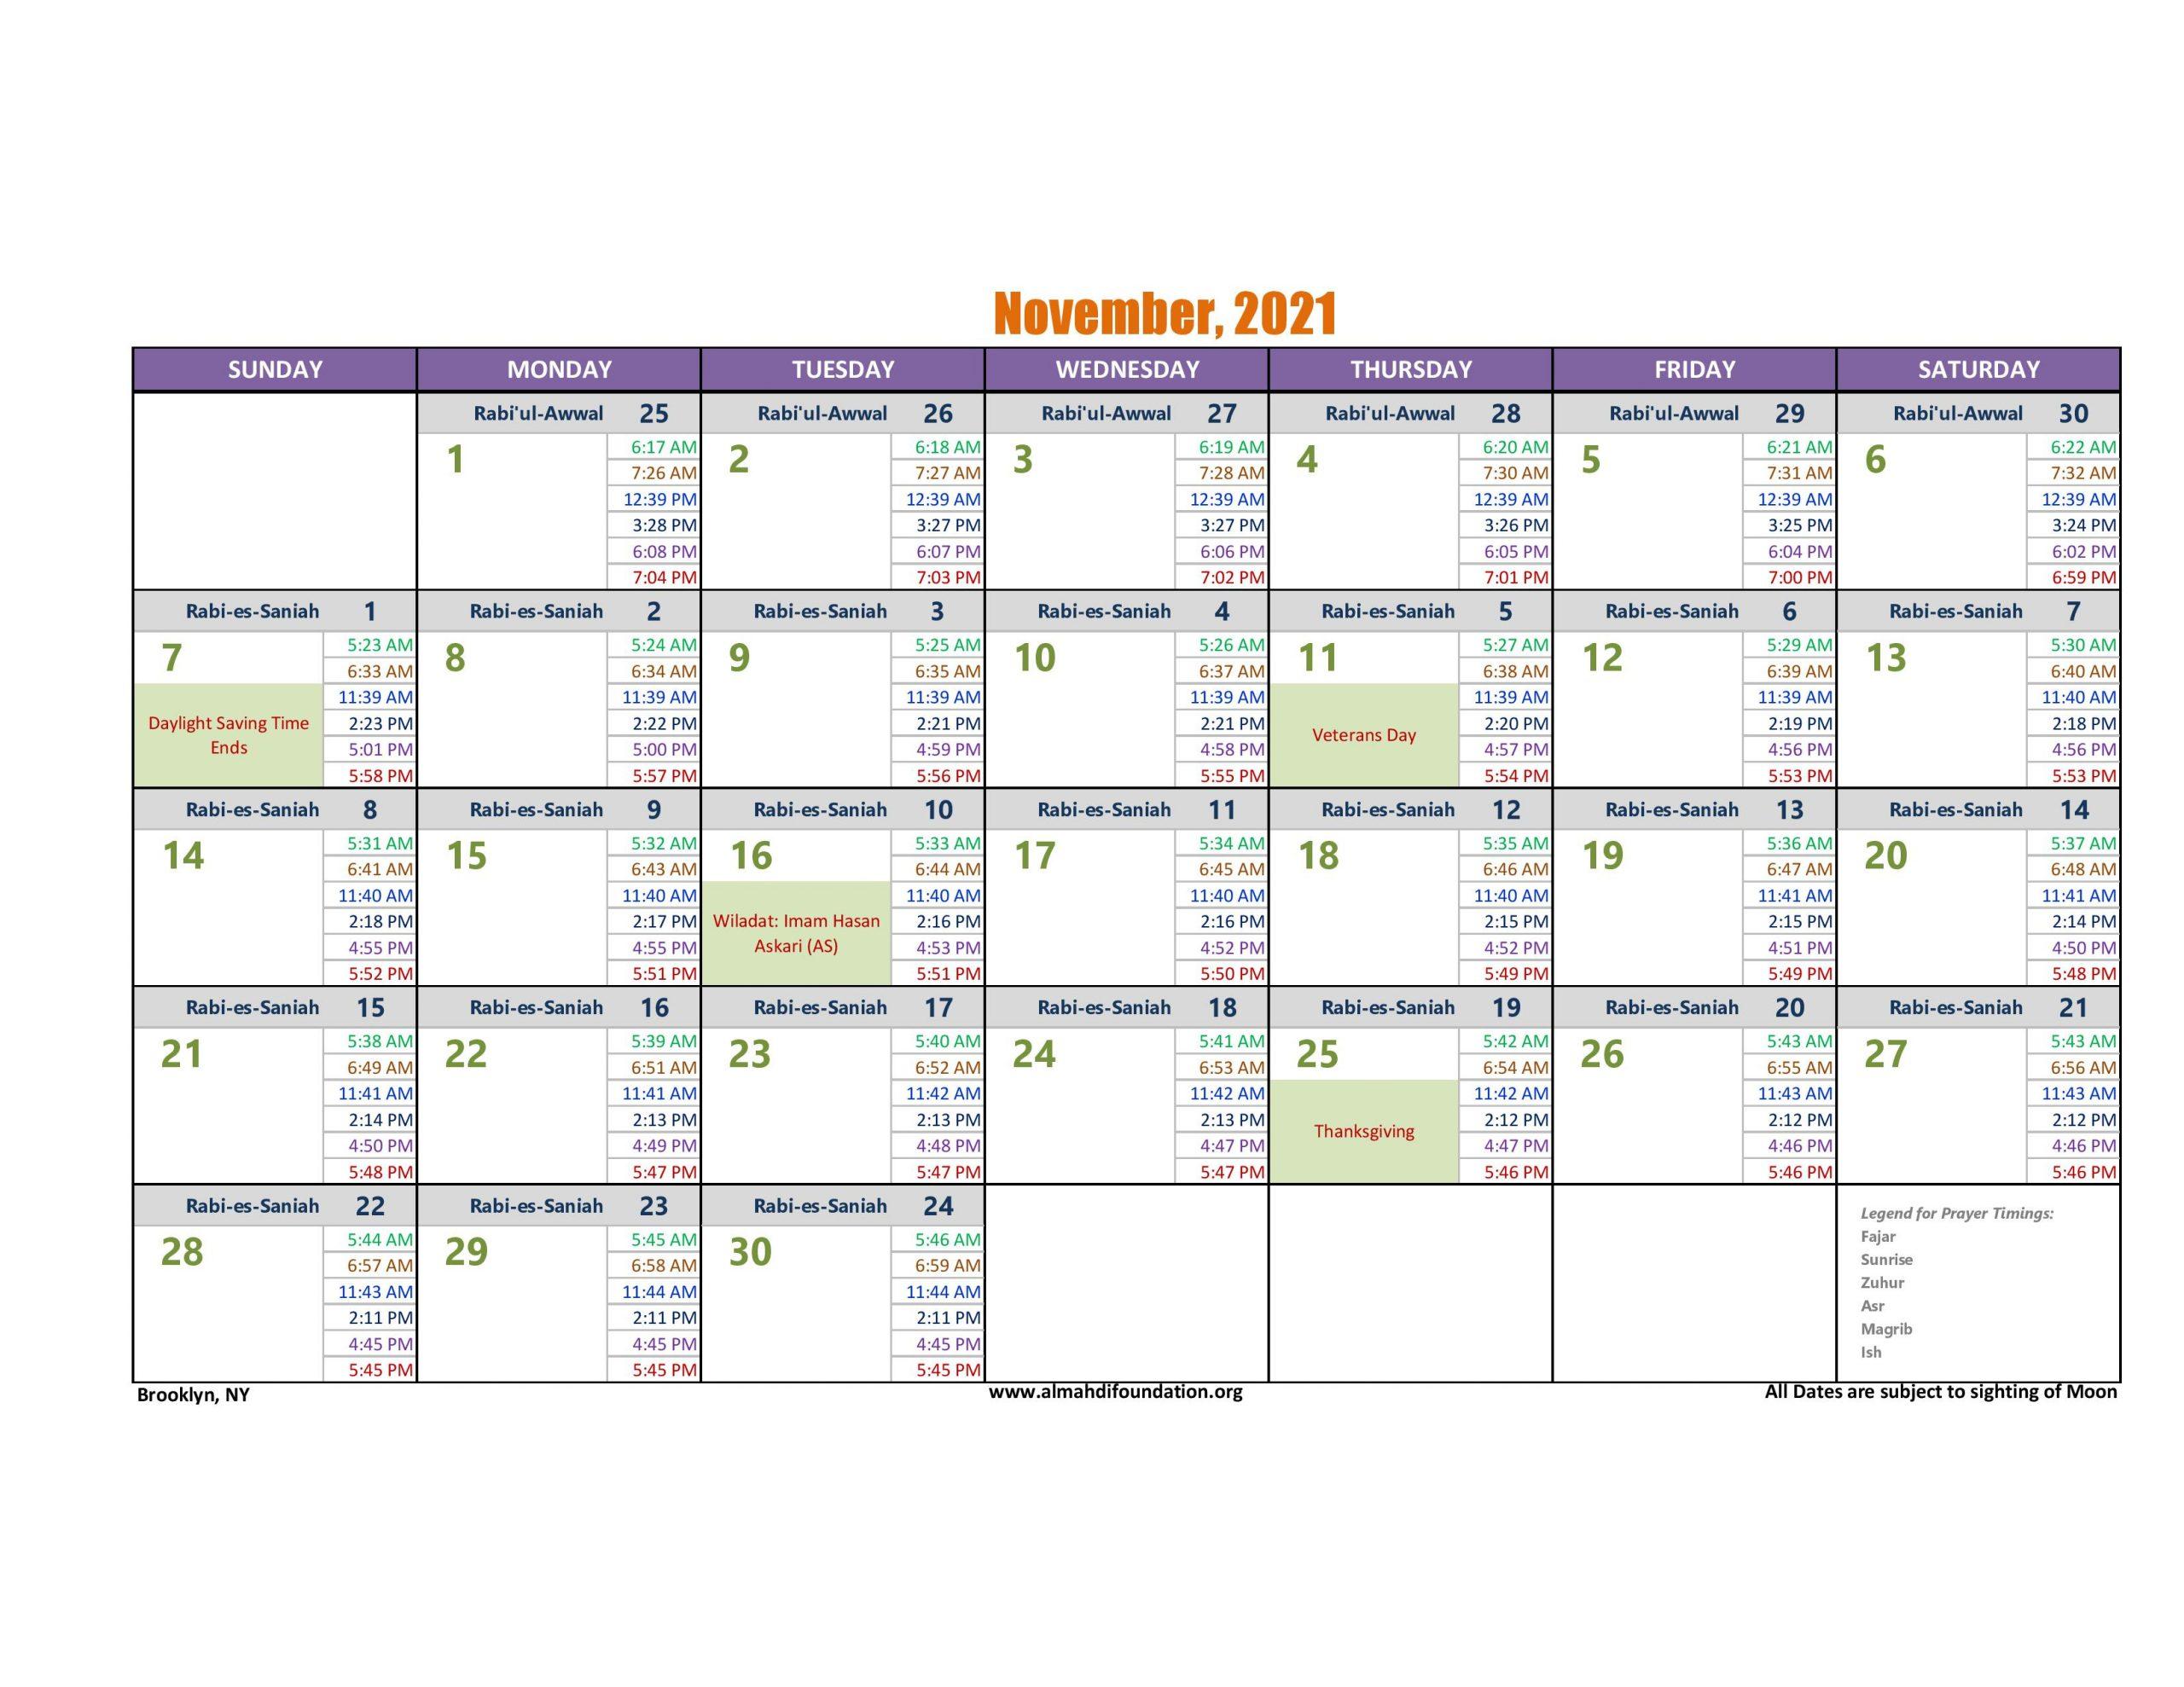 Islamic Calendar 2021 - Al-Mahdi Foundation, Inc. December 2021 Islamic Calendar